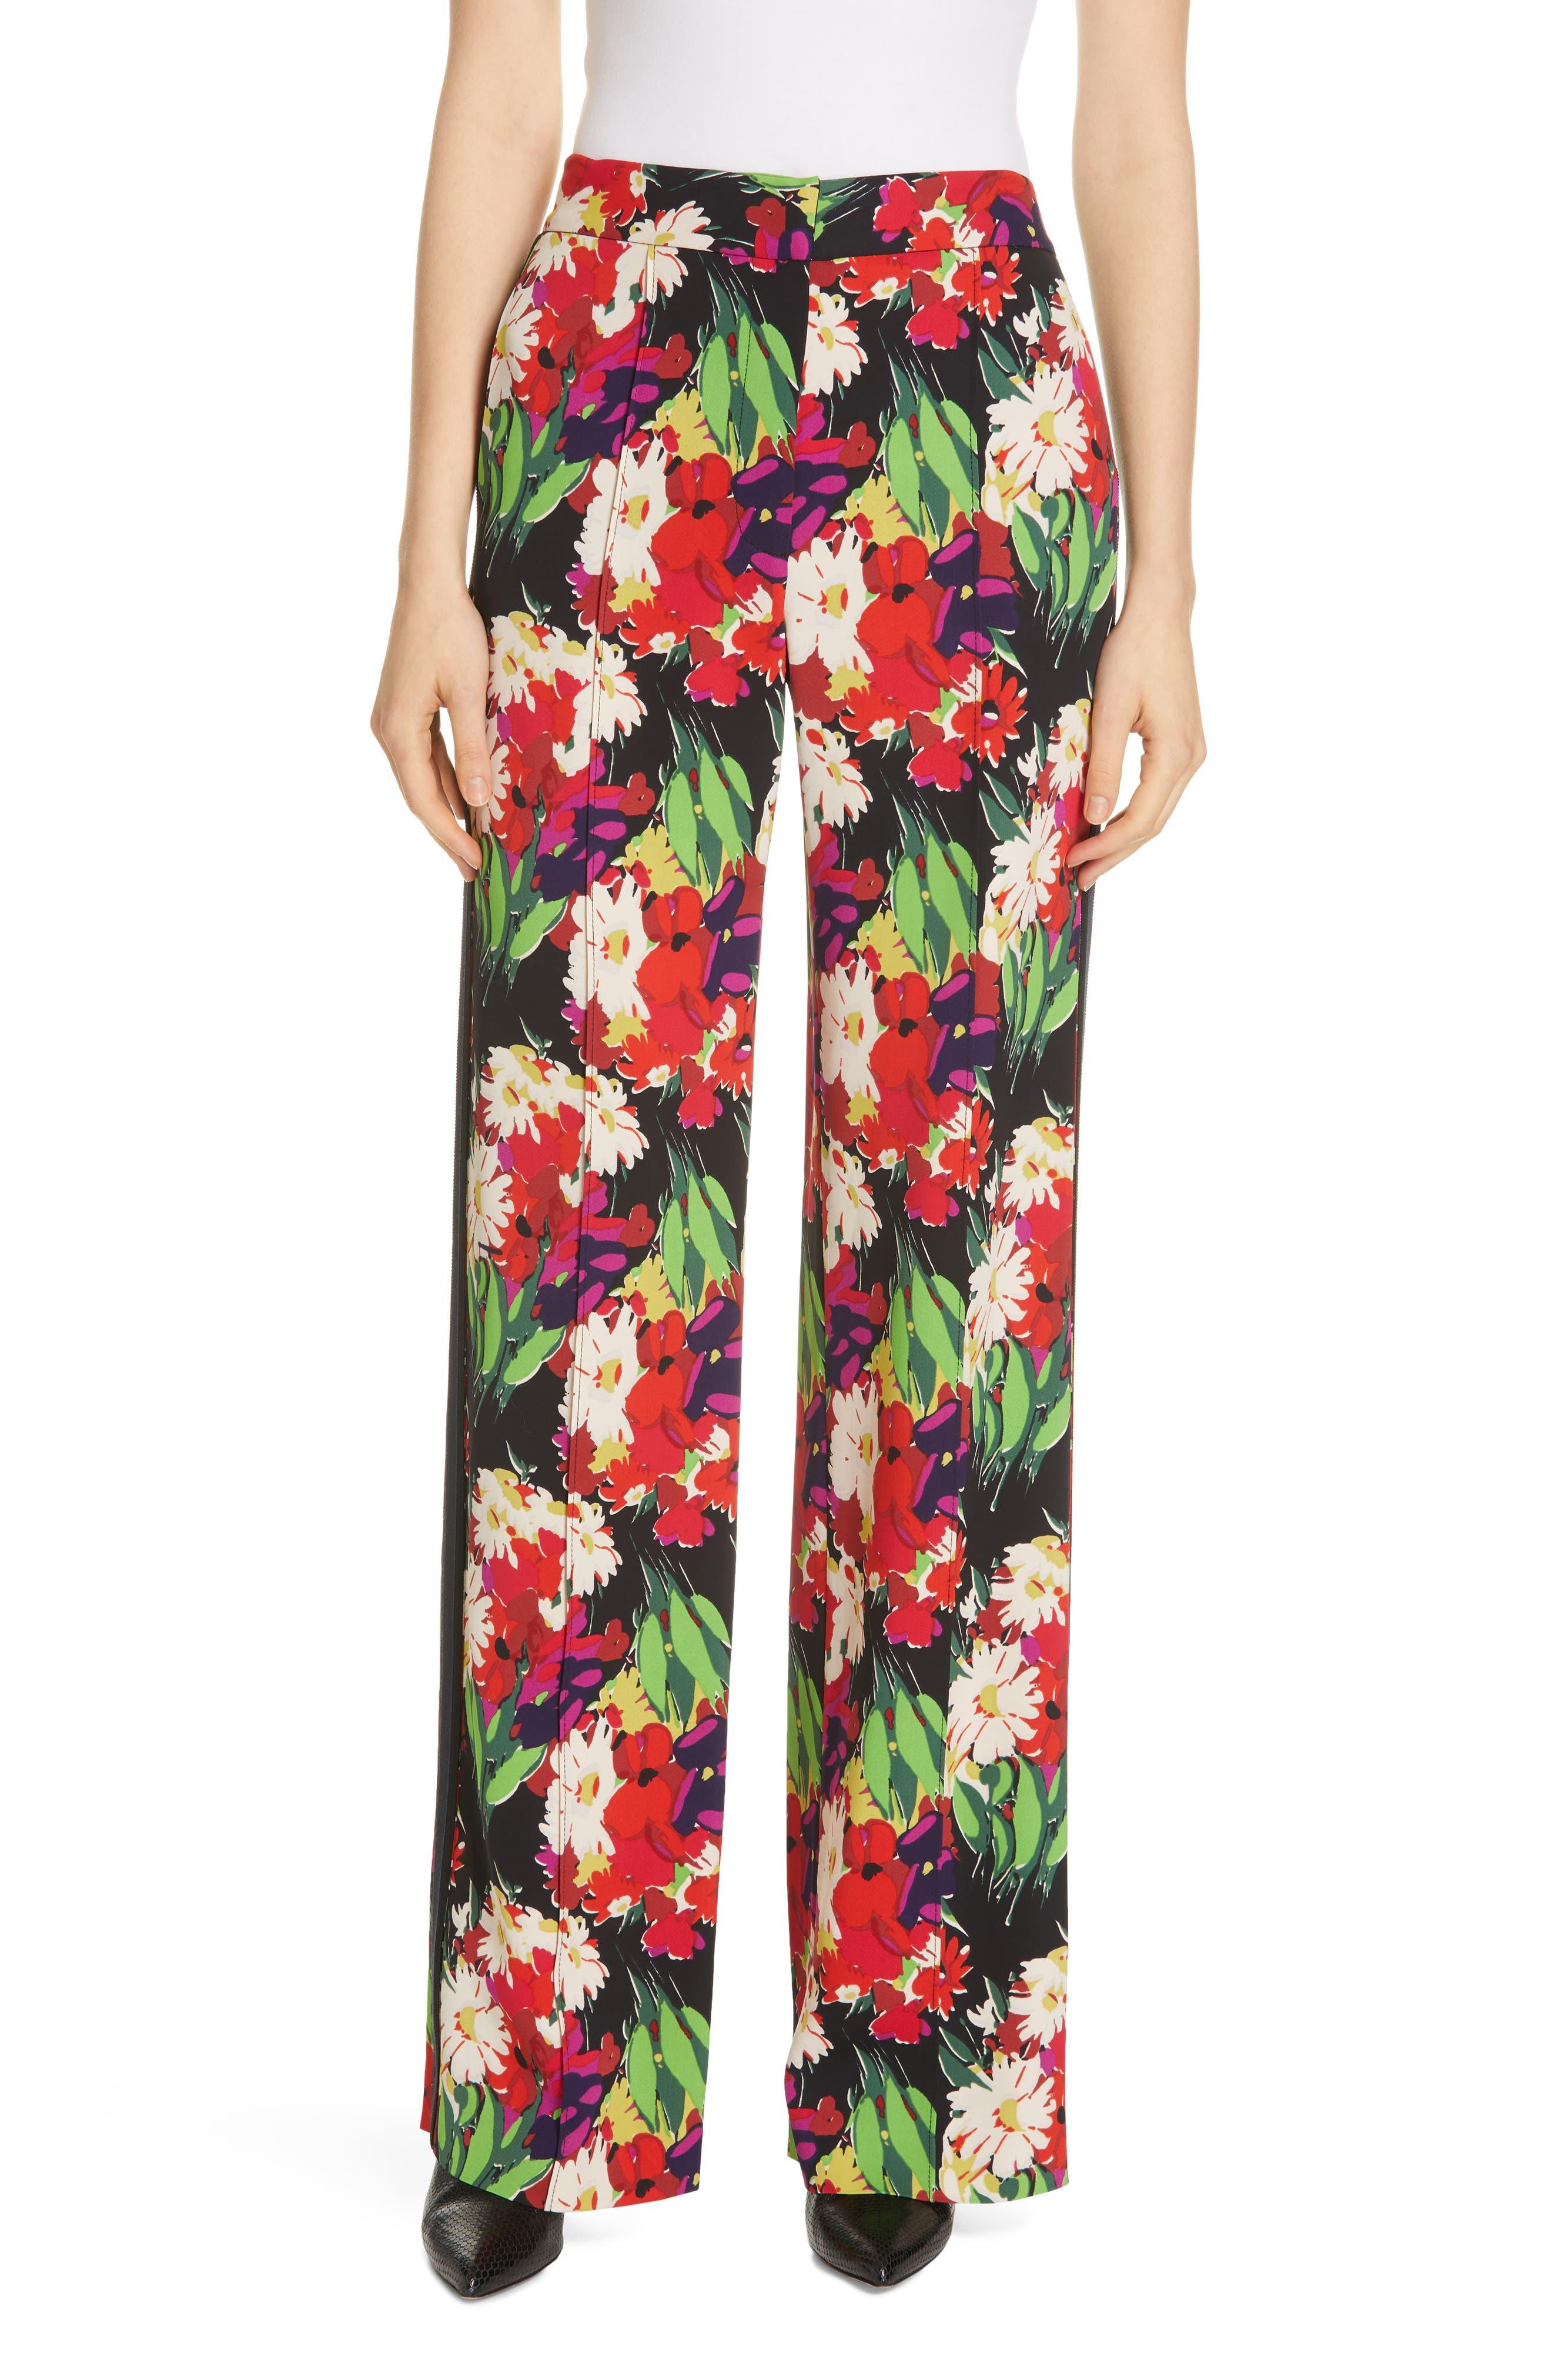 VERONICA BEARD Grigore Floral Print Wide Leg Pants, Main, color, BLACK MULTI